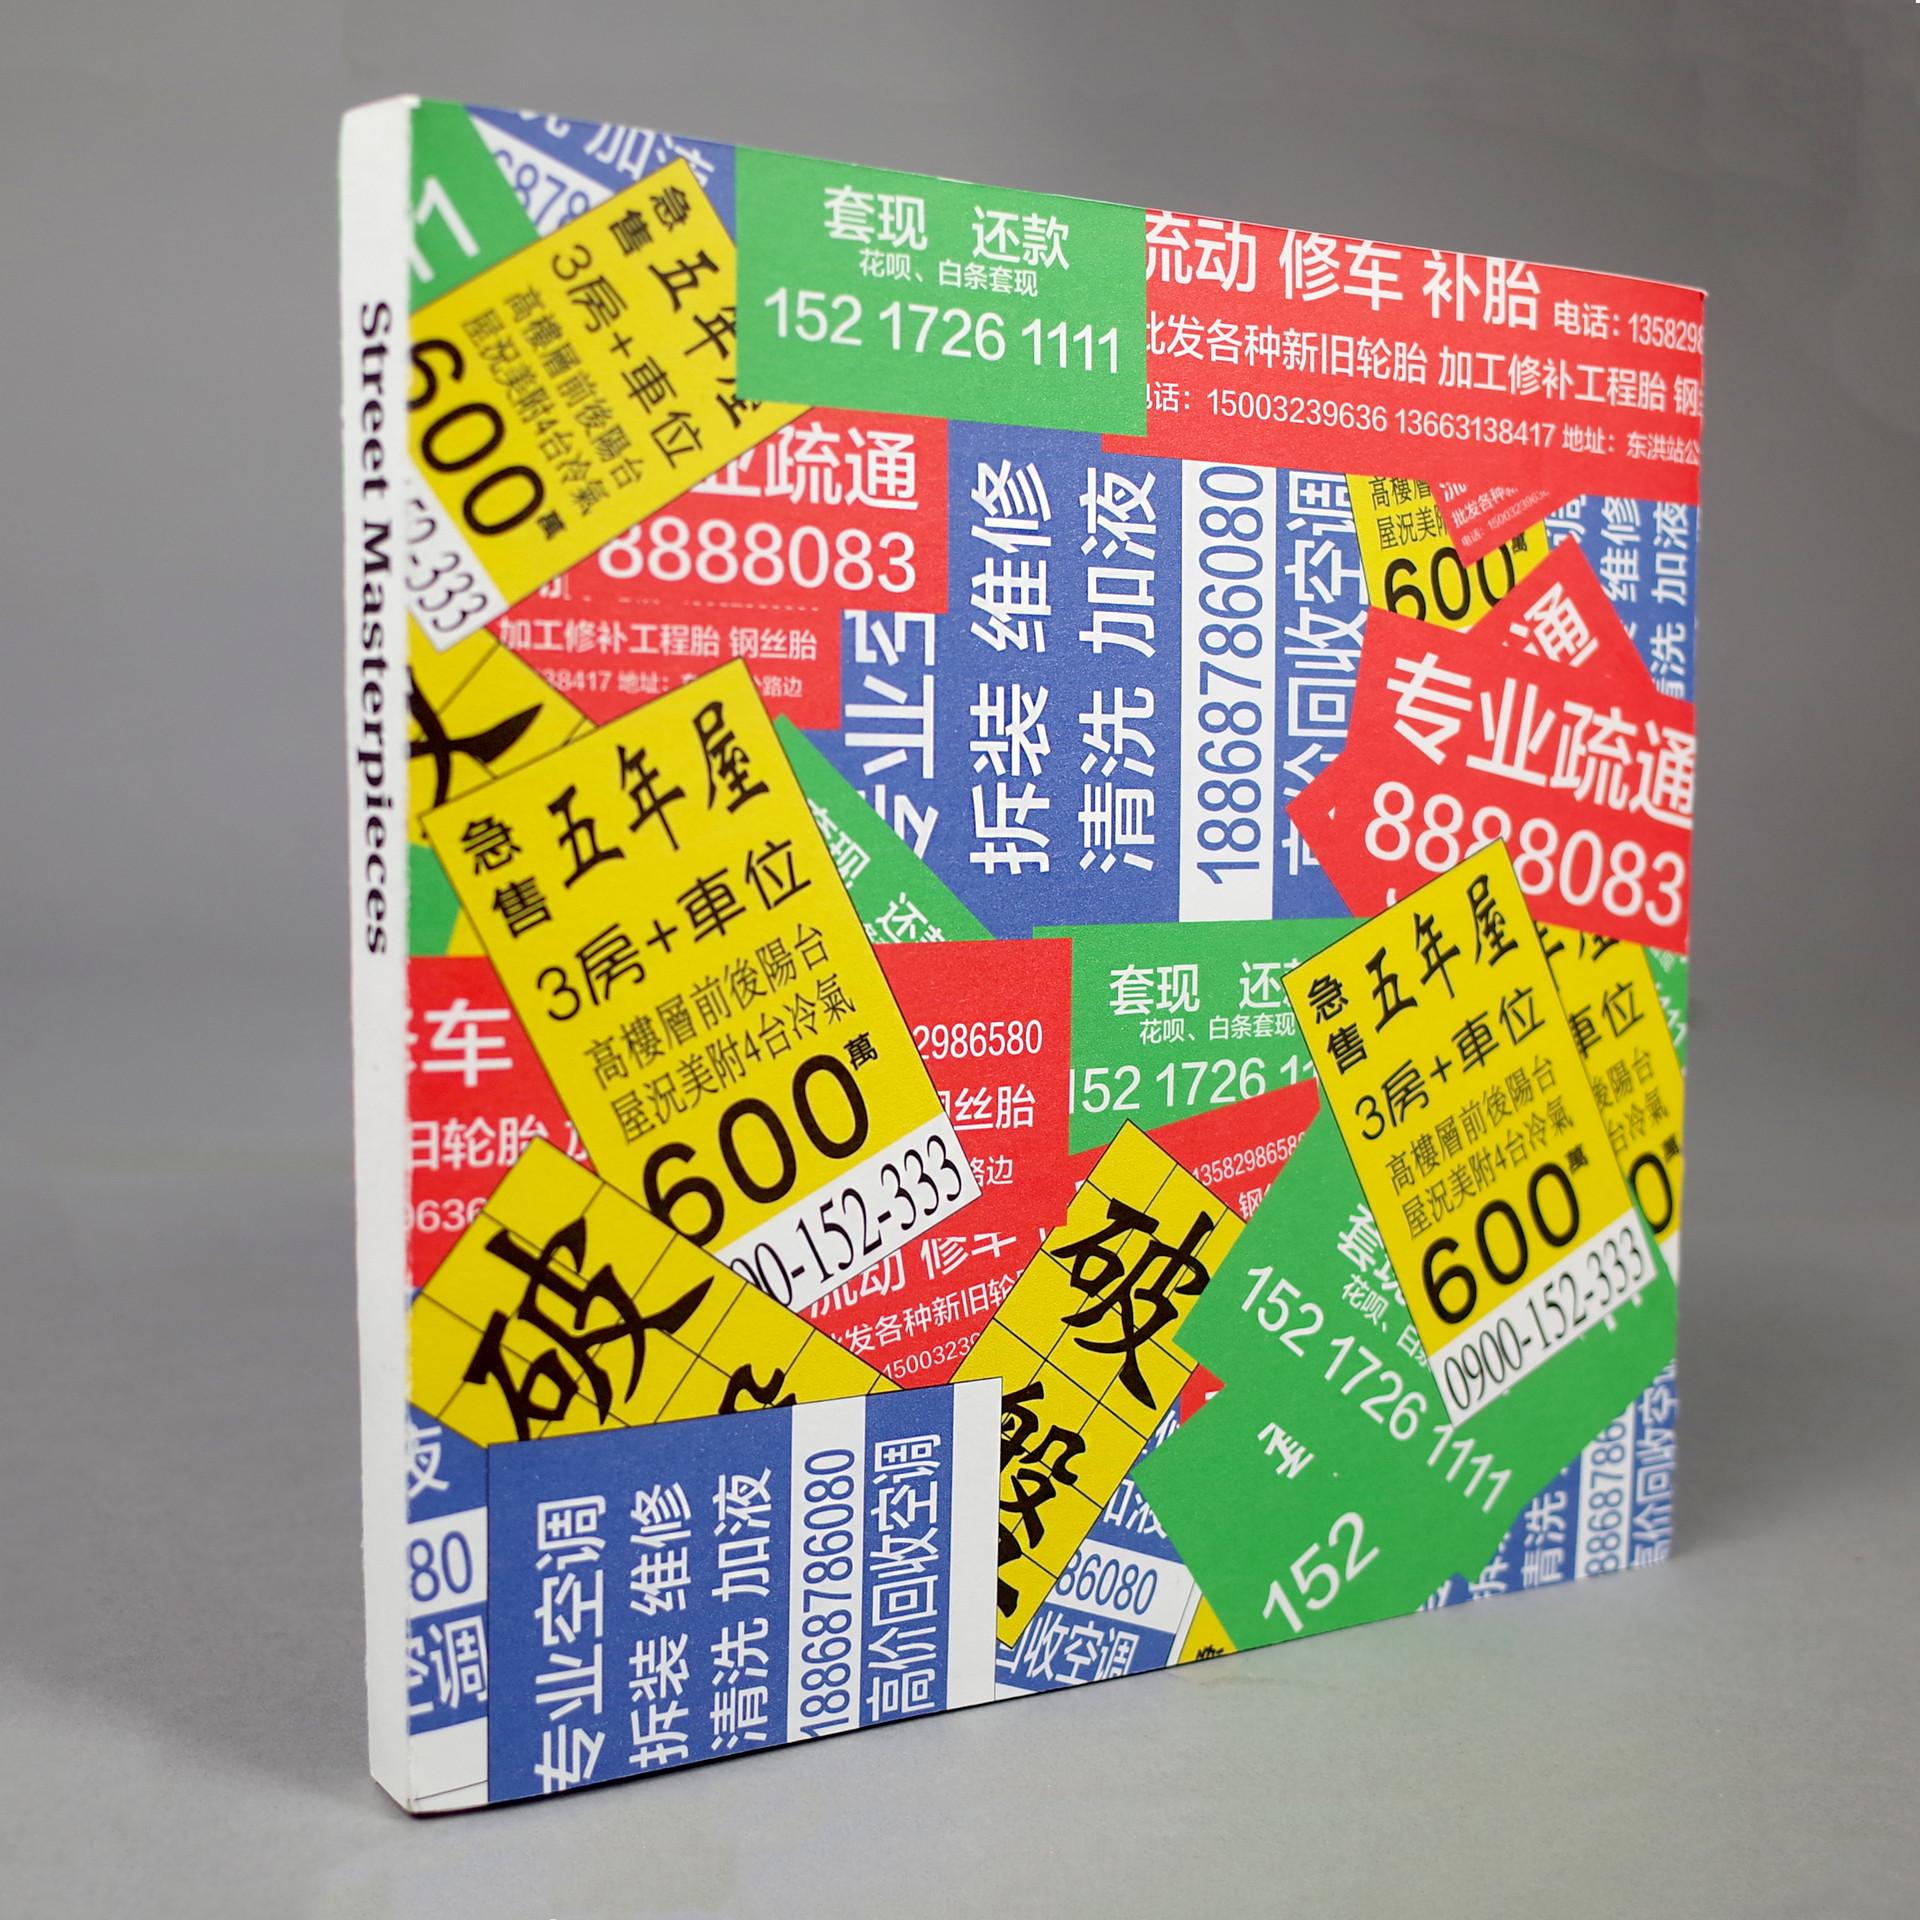 R0030833 copy copy.jpg